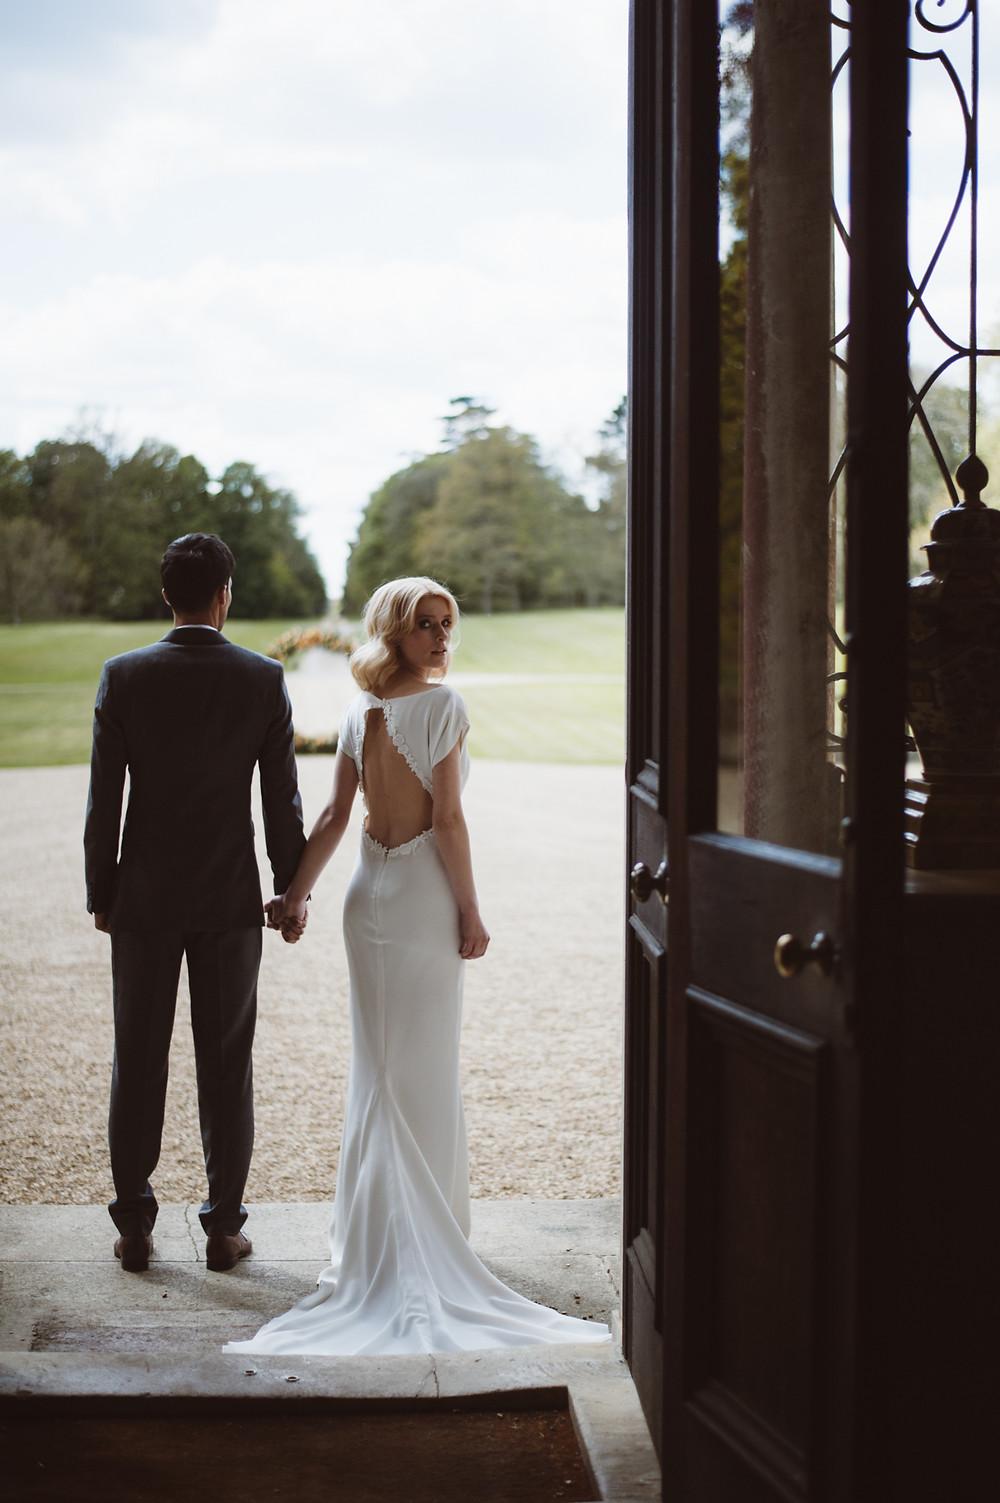 Somerley House Wedding Inspiration | Weddings by Jenna Hewitt